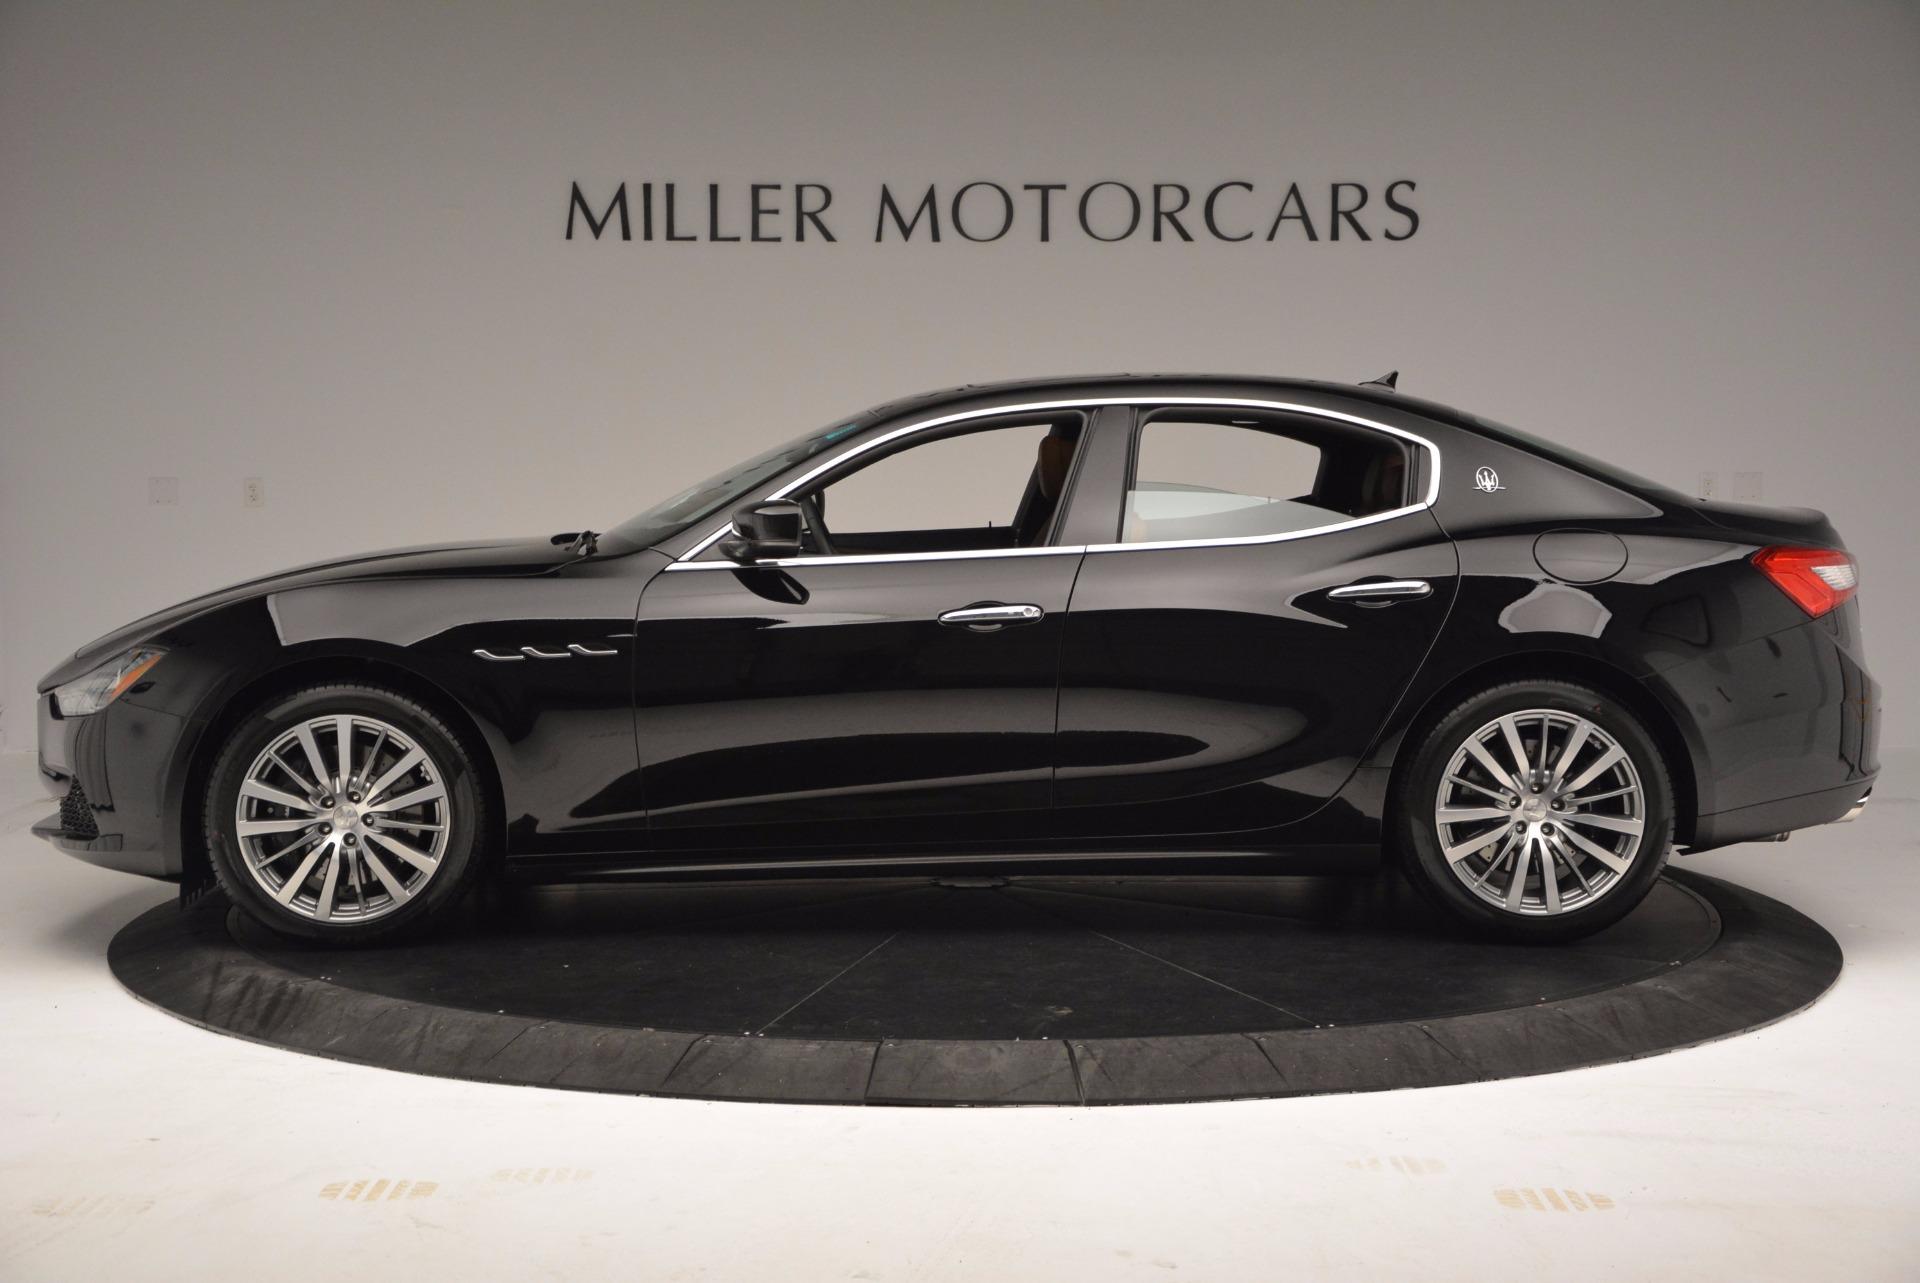 New 2017 Maserati Ghibli S Q4 EX-LOANER For Sale In Greenwich, CT 1115_p3